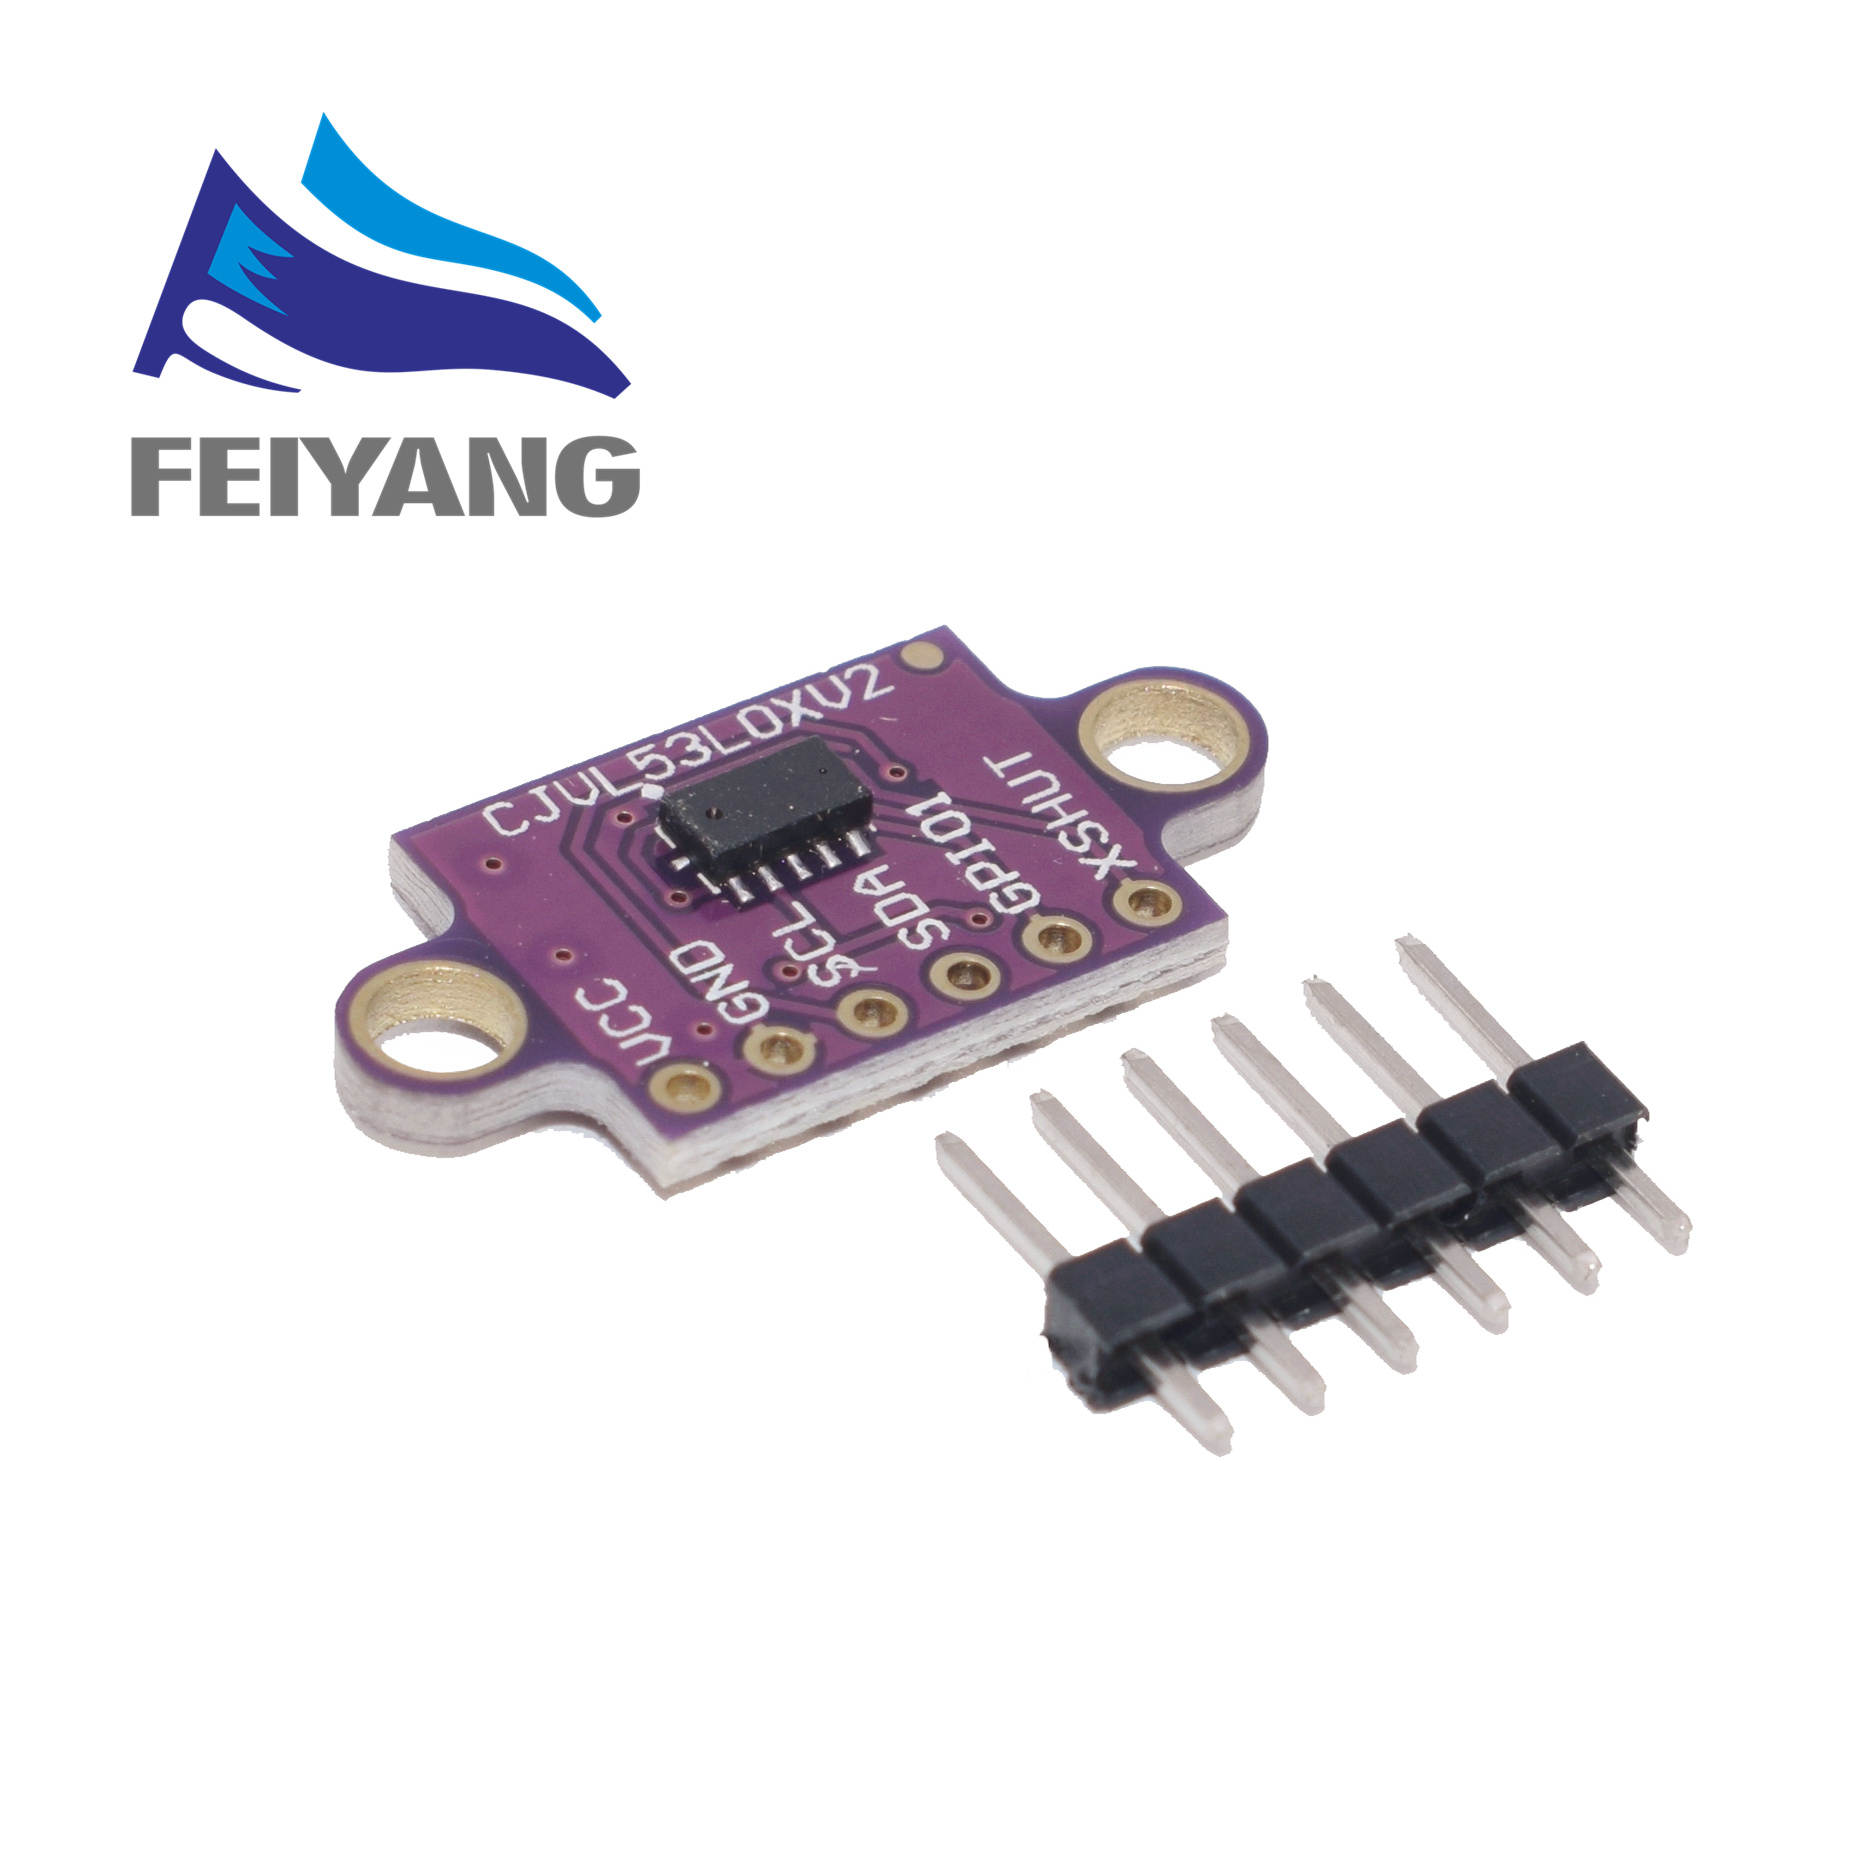 VL53L0X Time-of-Flight (ToF) Laser Ranging Sensor Breakout 940nm GY-VL53L0XV2 Laser Distance Module I2C IIC